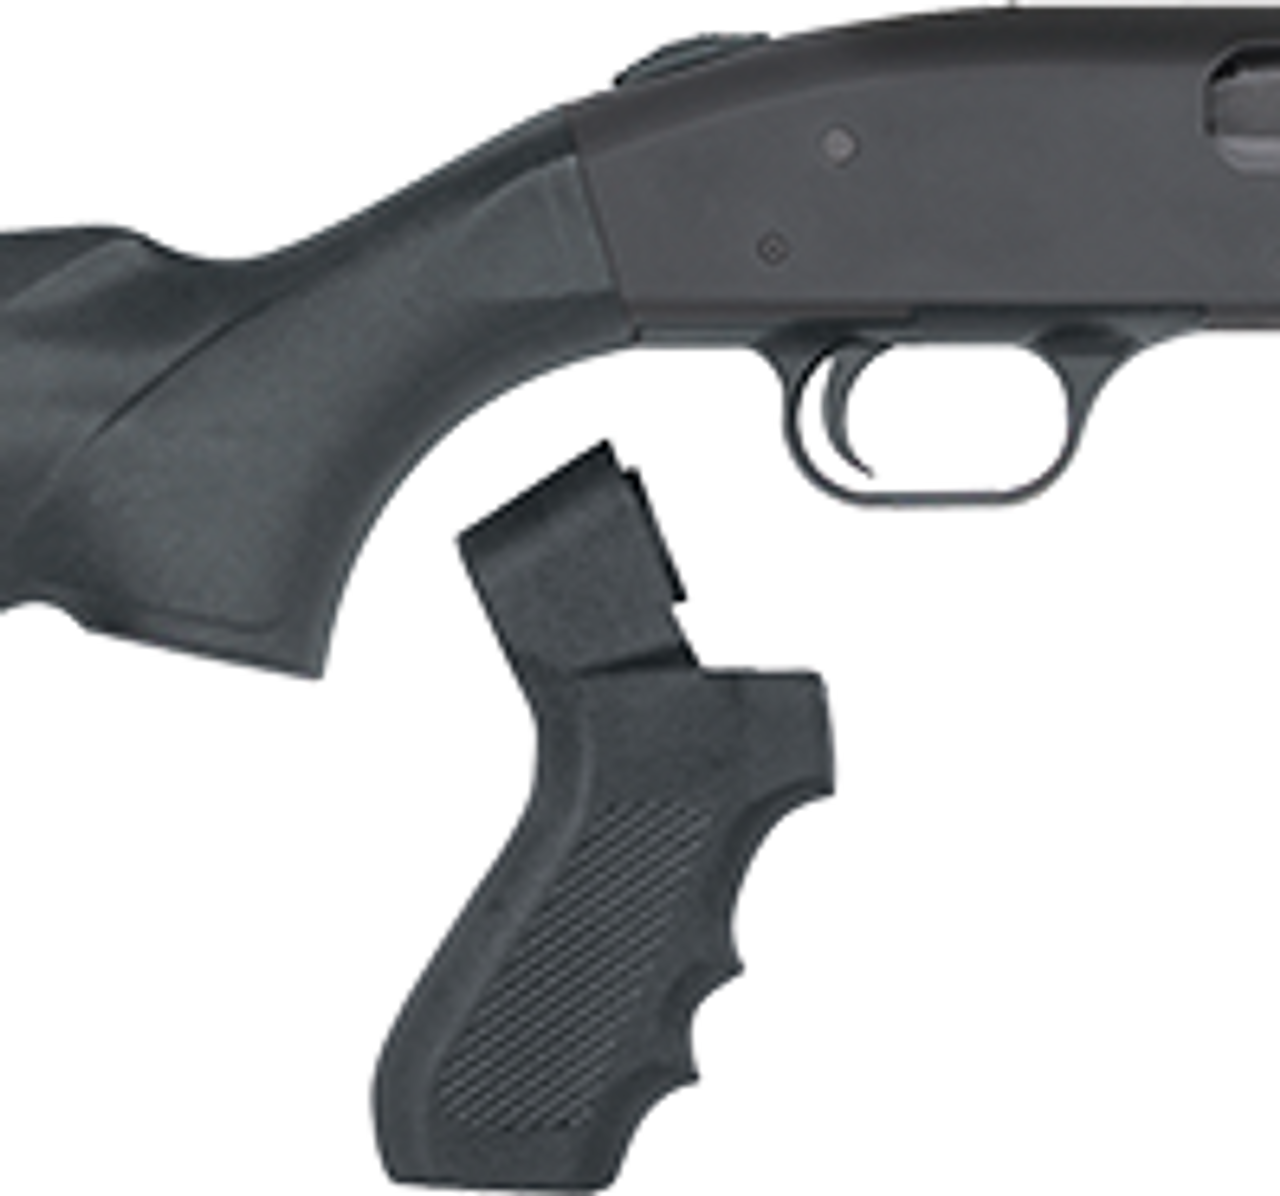 Maverick 88 Security w/Pistol Grip Kit CALIFORNIA LEGAL - 12ga